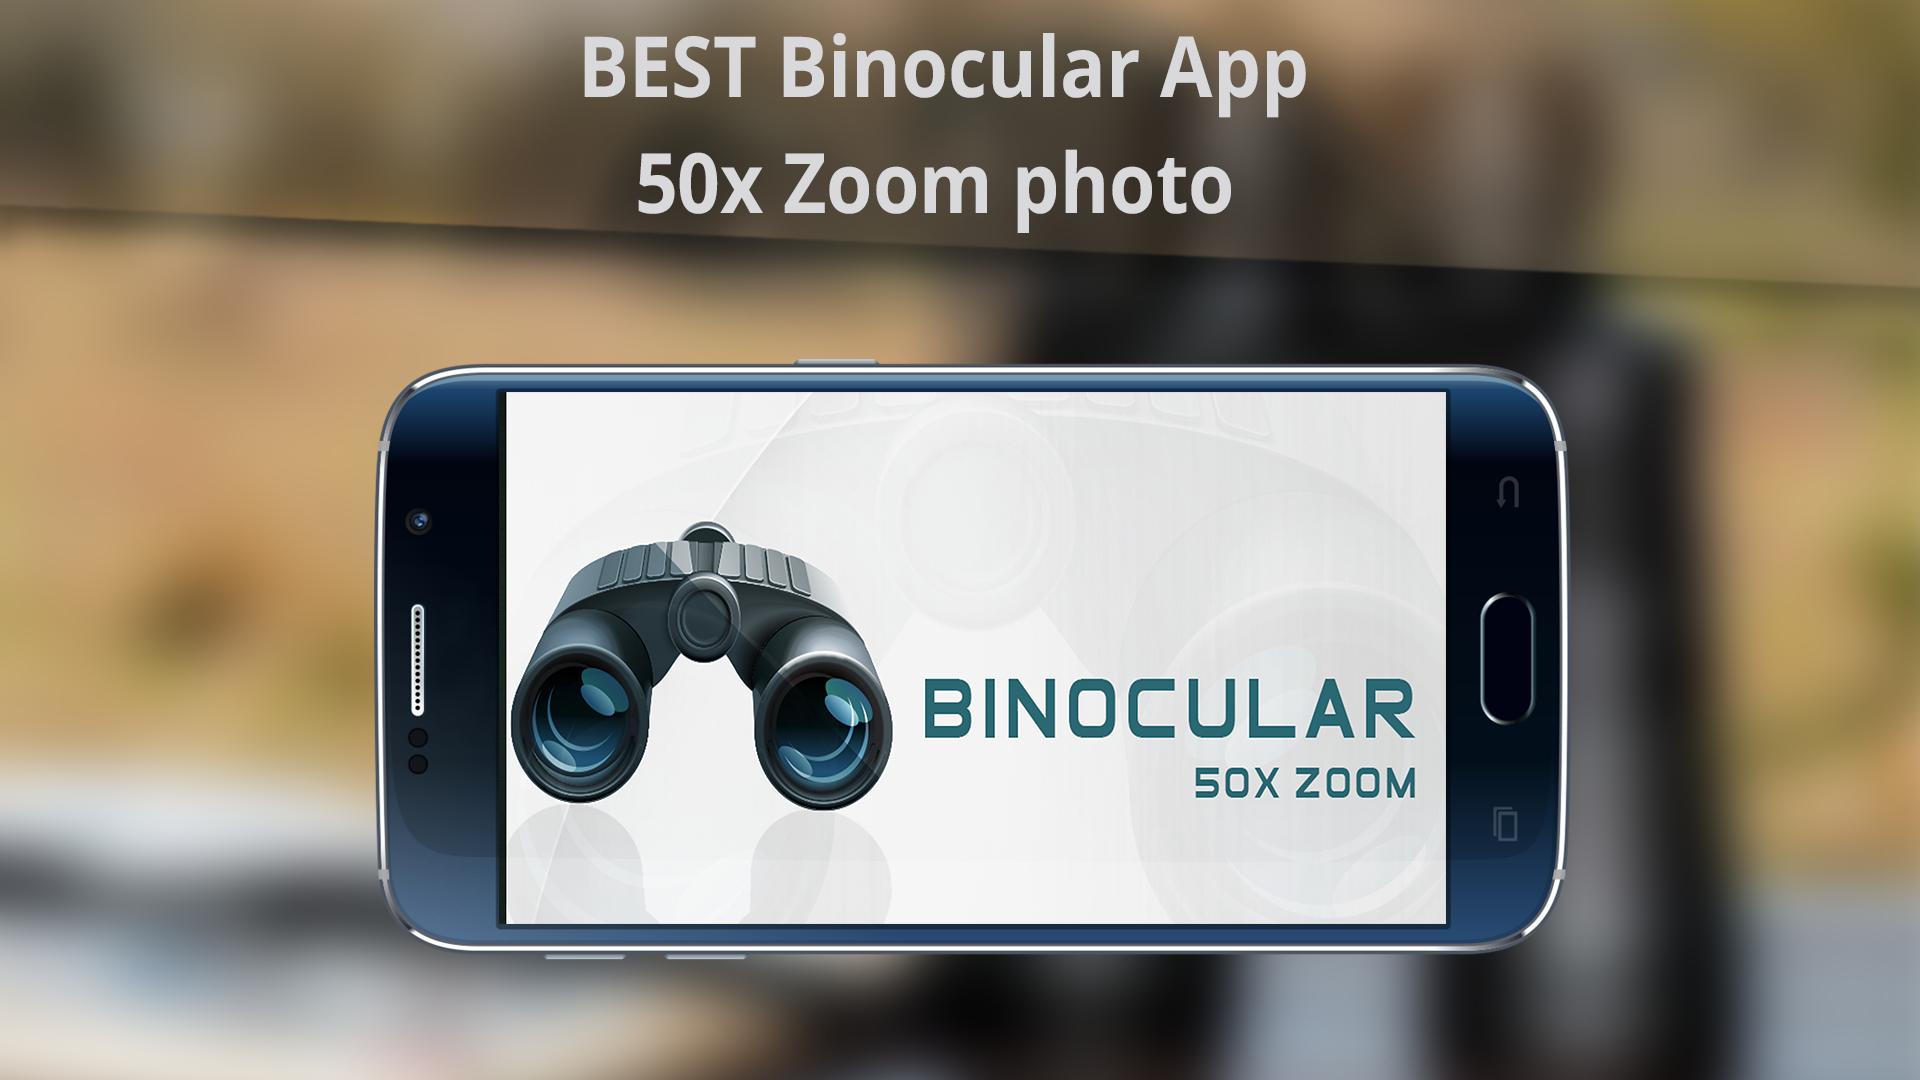 Amazon com: Binoculars App - Zoom Camera: Appstore for Android